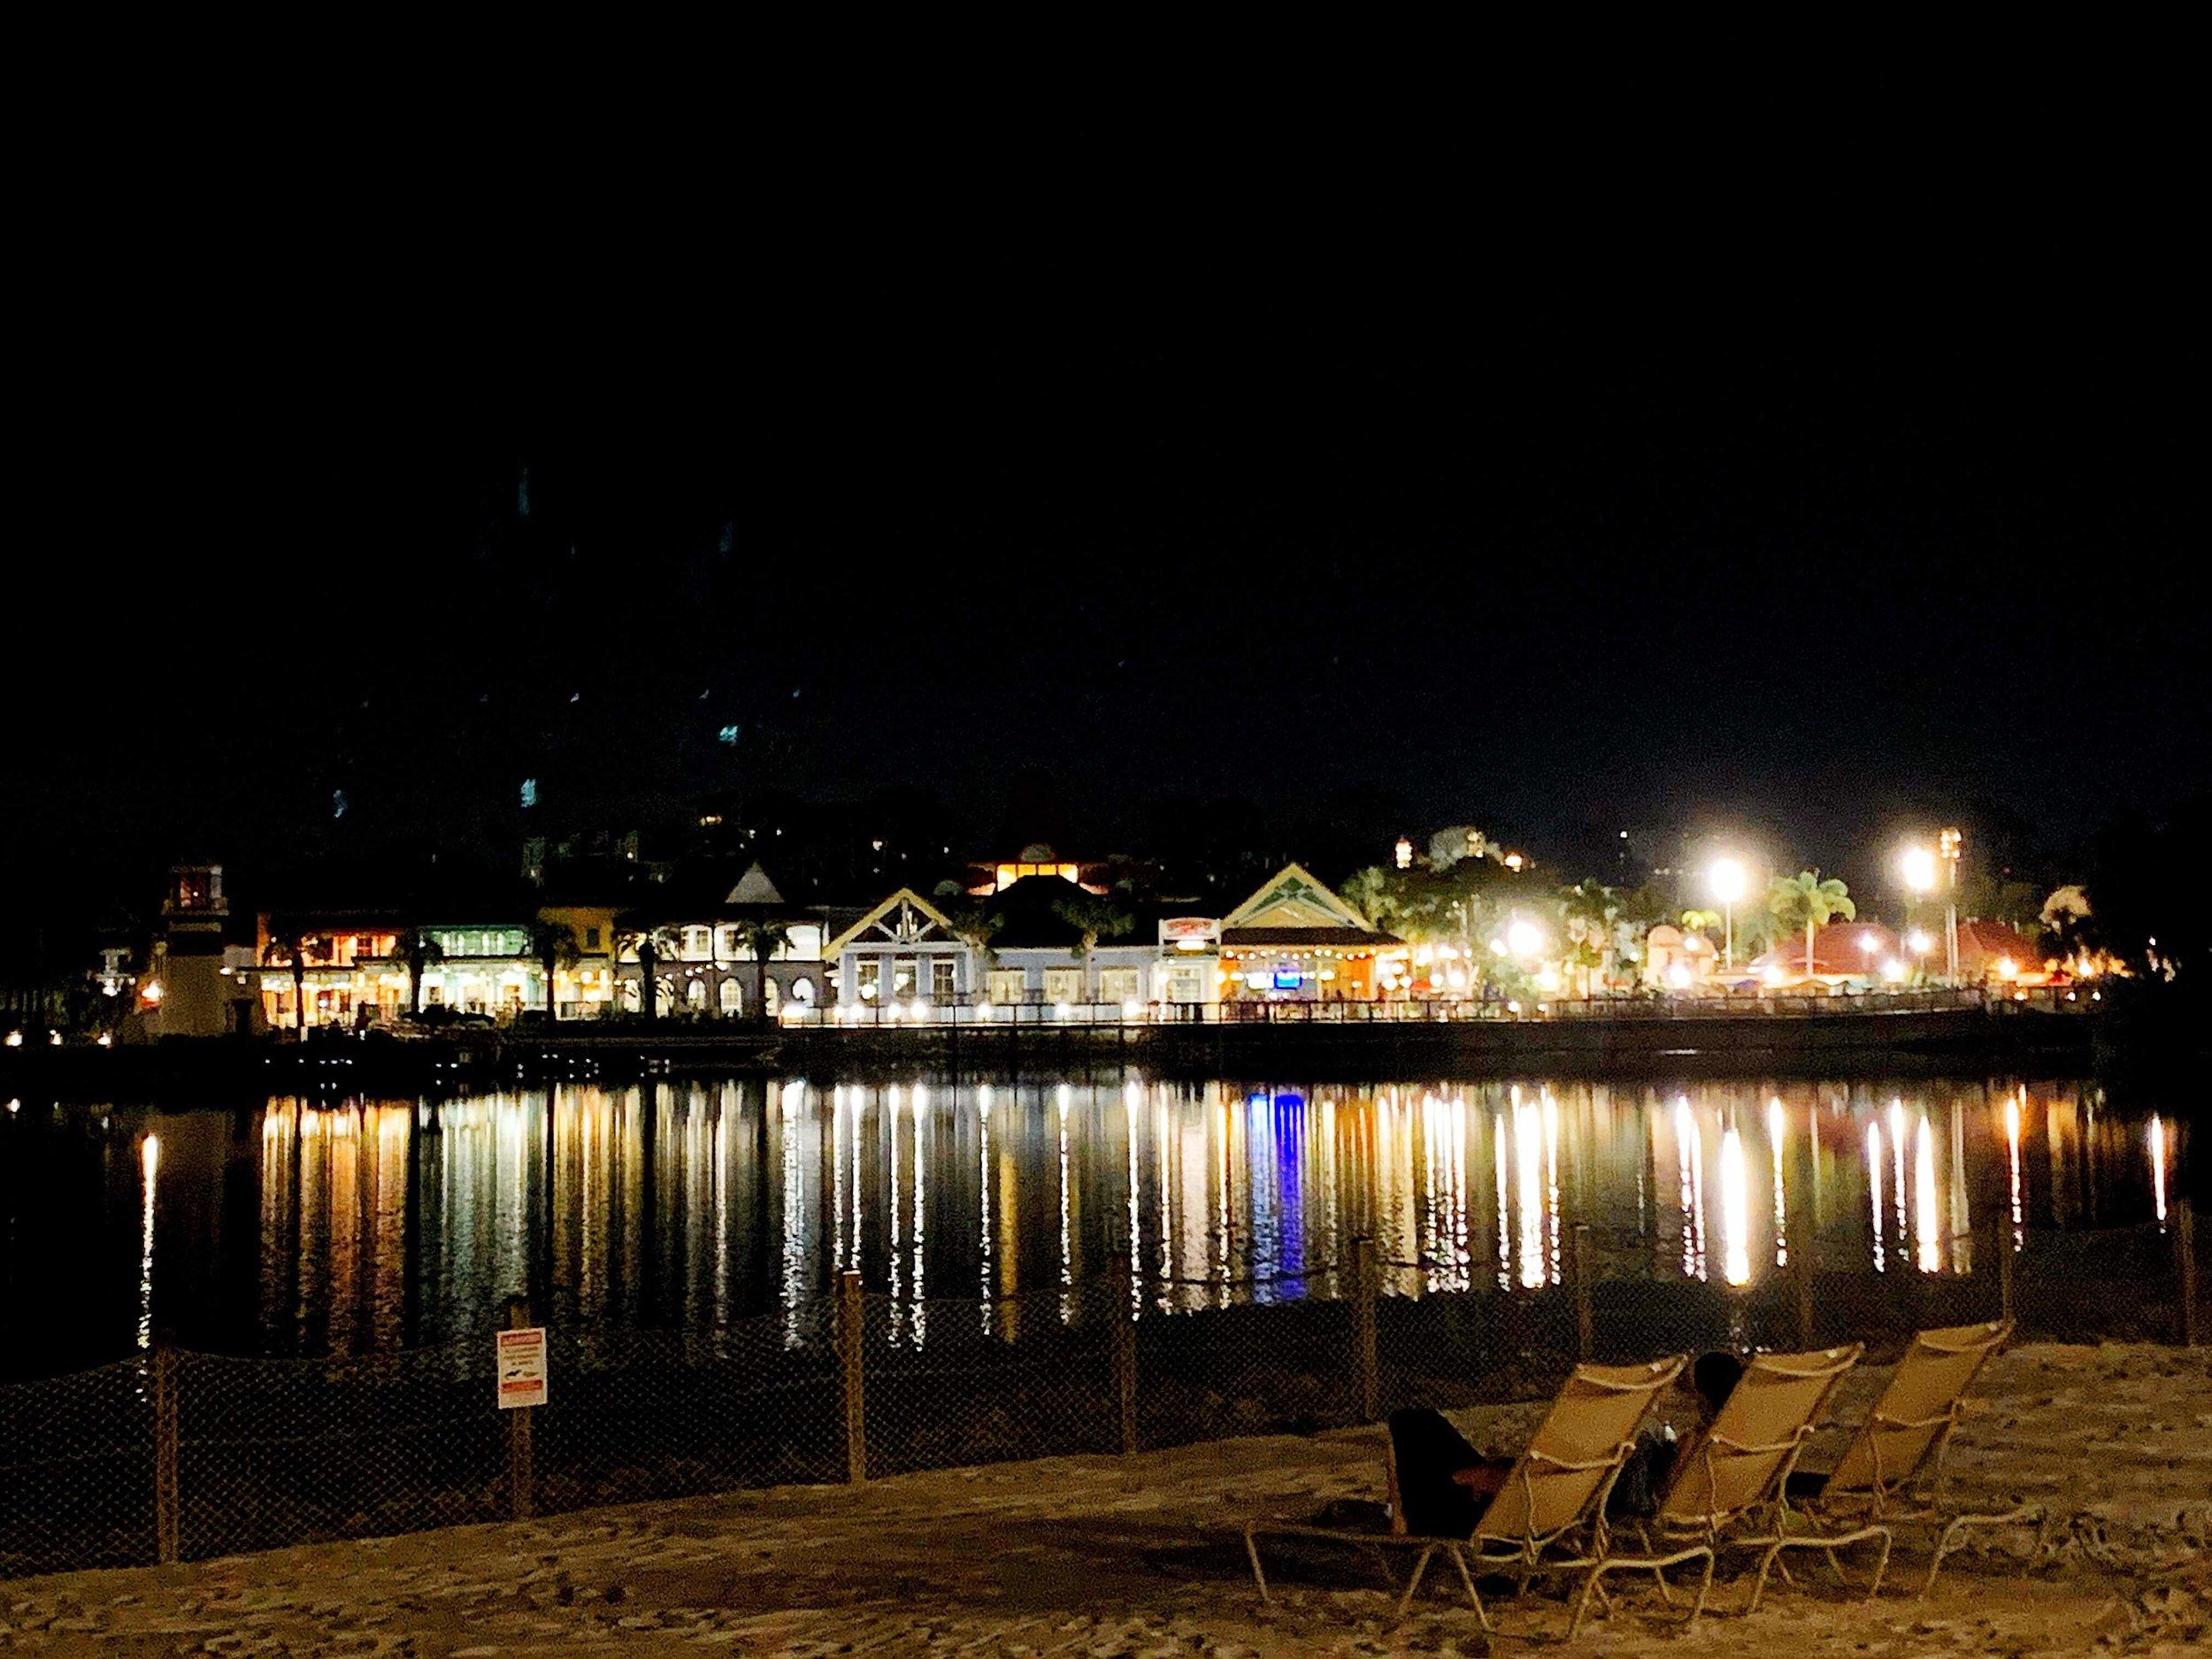 Disney's Caribbean Beach Resort at night